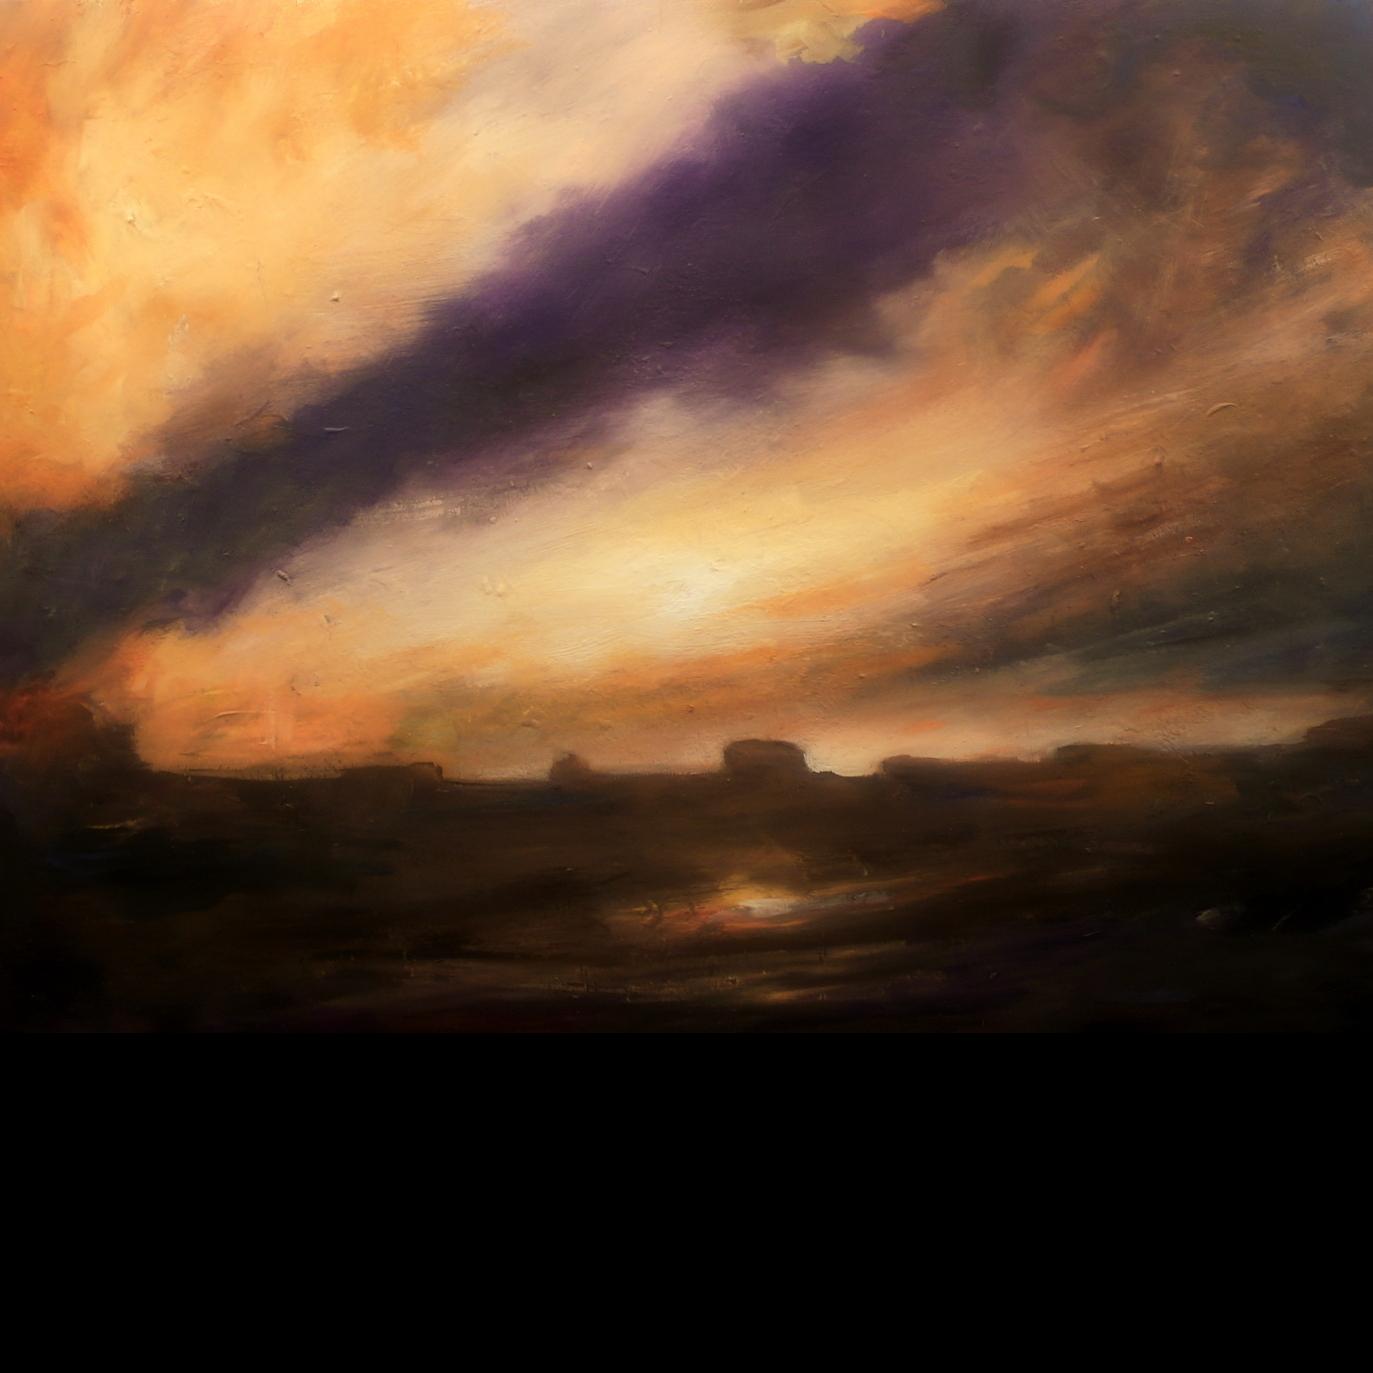 fine art painting, oil painting, artist Tobin Karicher, October Sky in Virginia, horse country, storm sky